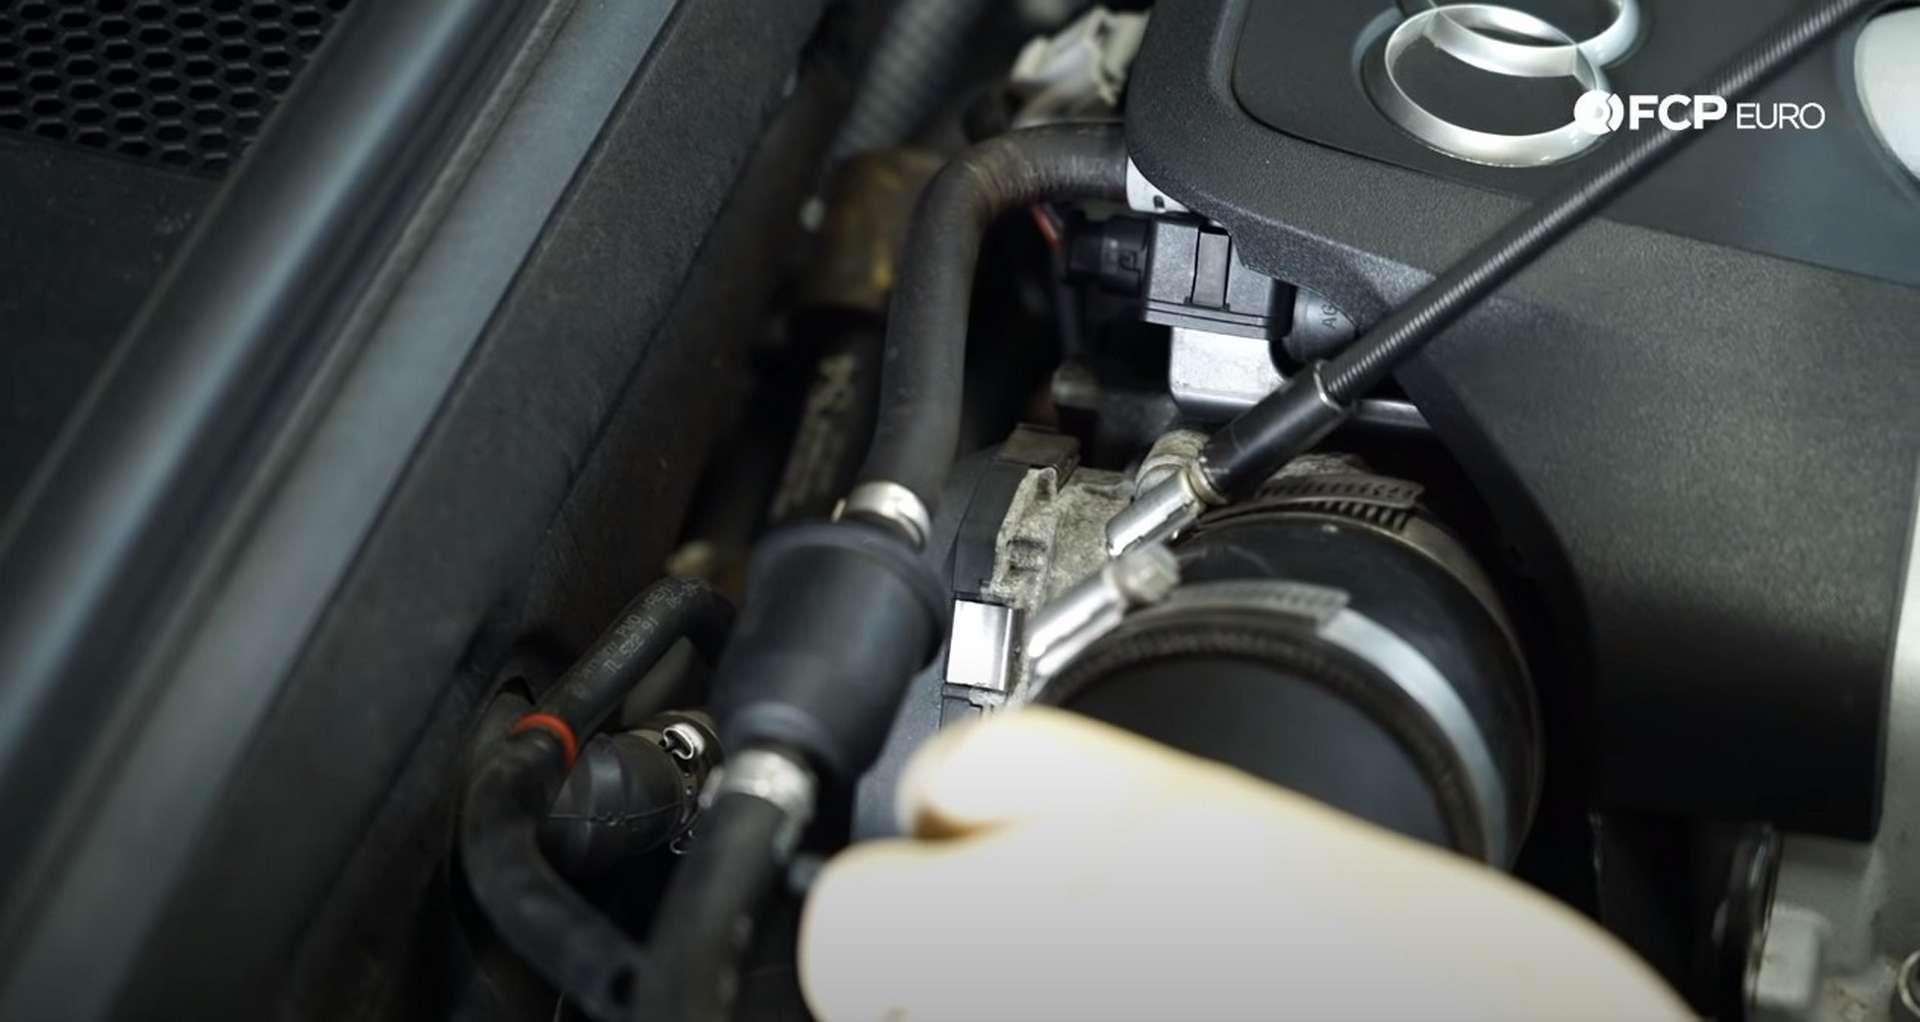 DIY Audi 3.0T PCV/AOS Replacement loosening the intake hose clamp